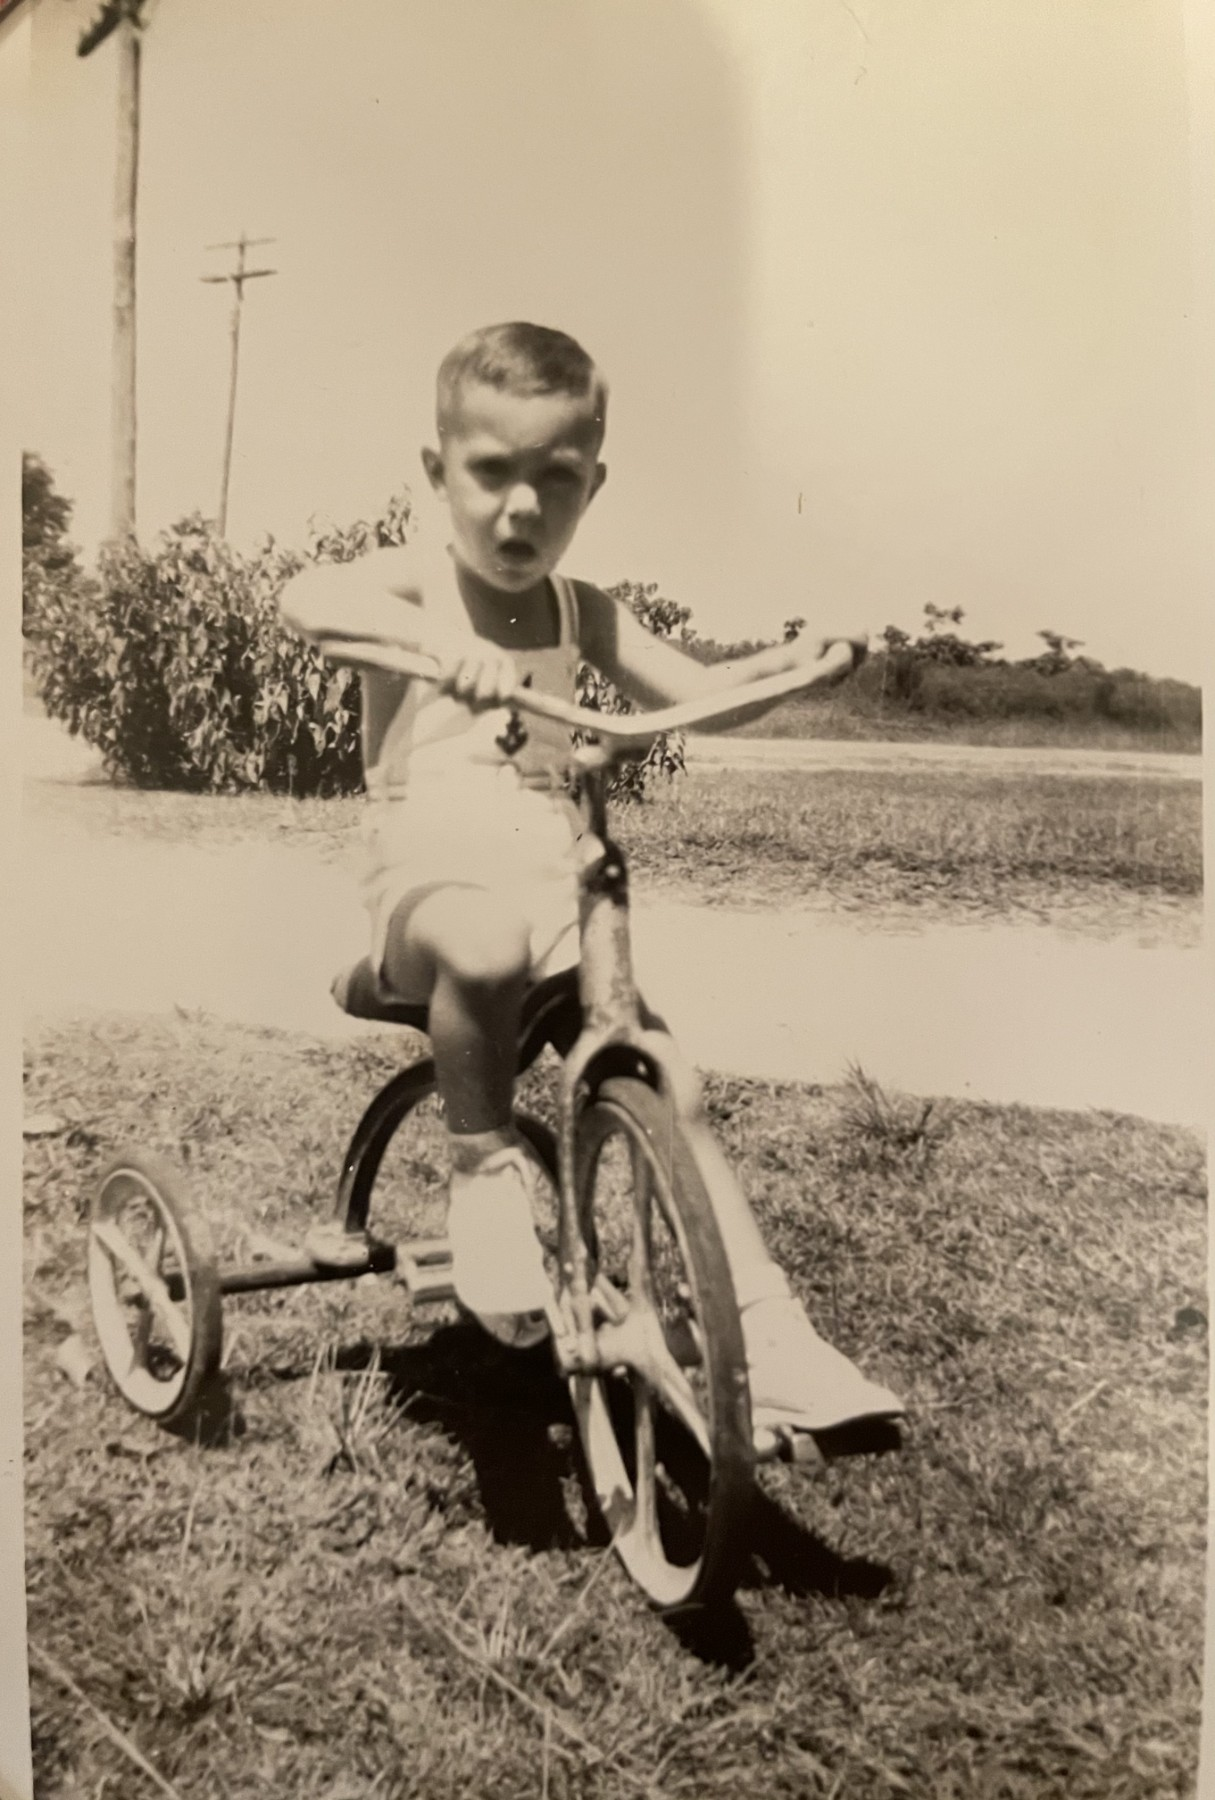 Giant Bikes Houston : giant, bikes, houston, George, DeFranco, Obituary, Gadsden,